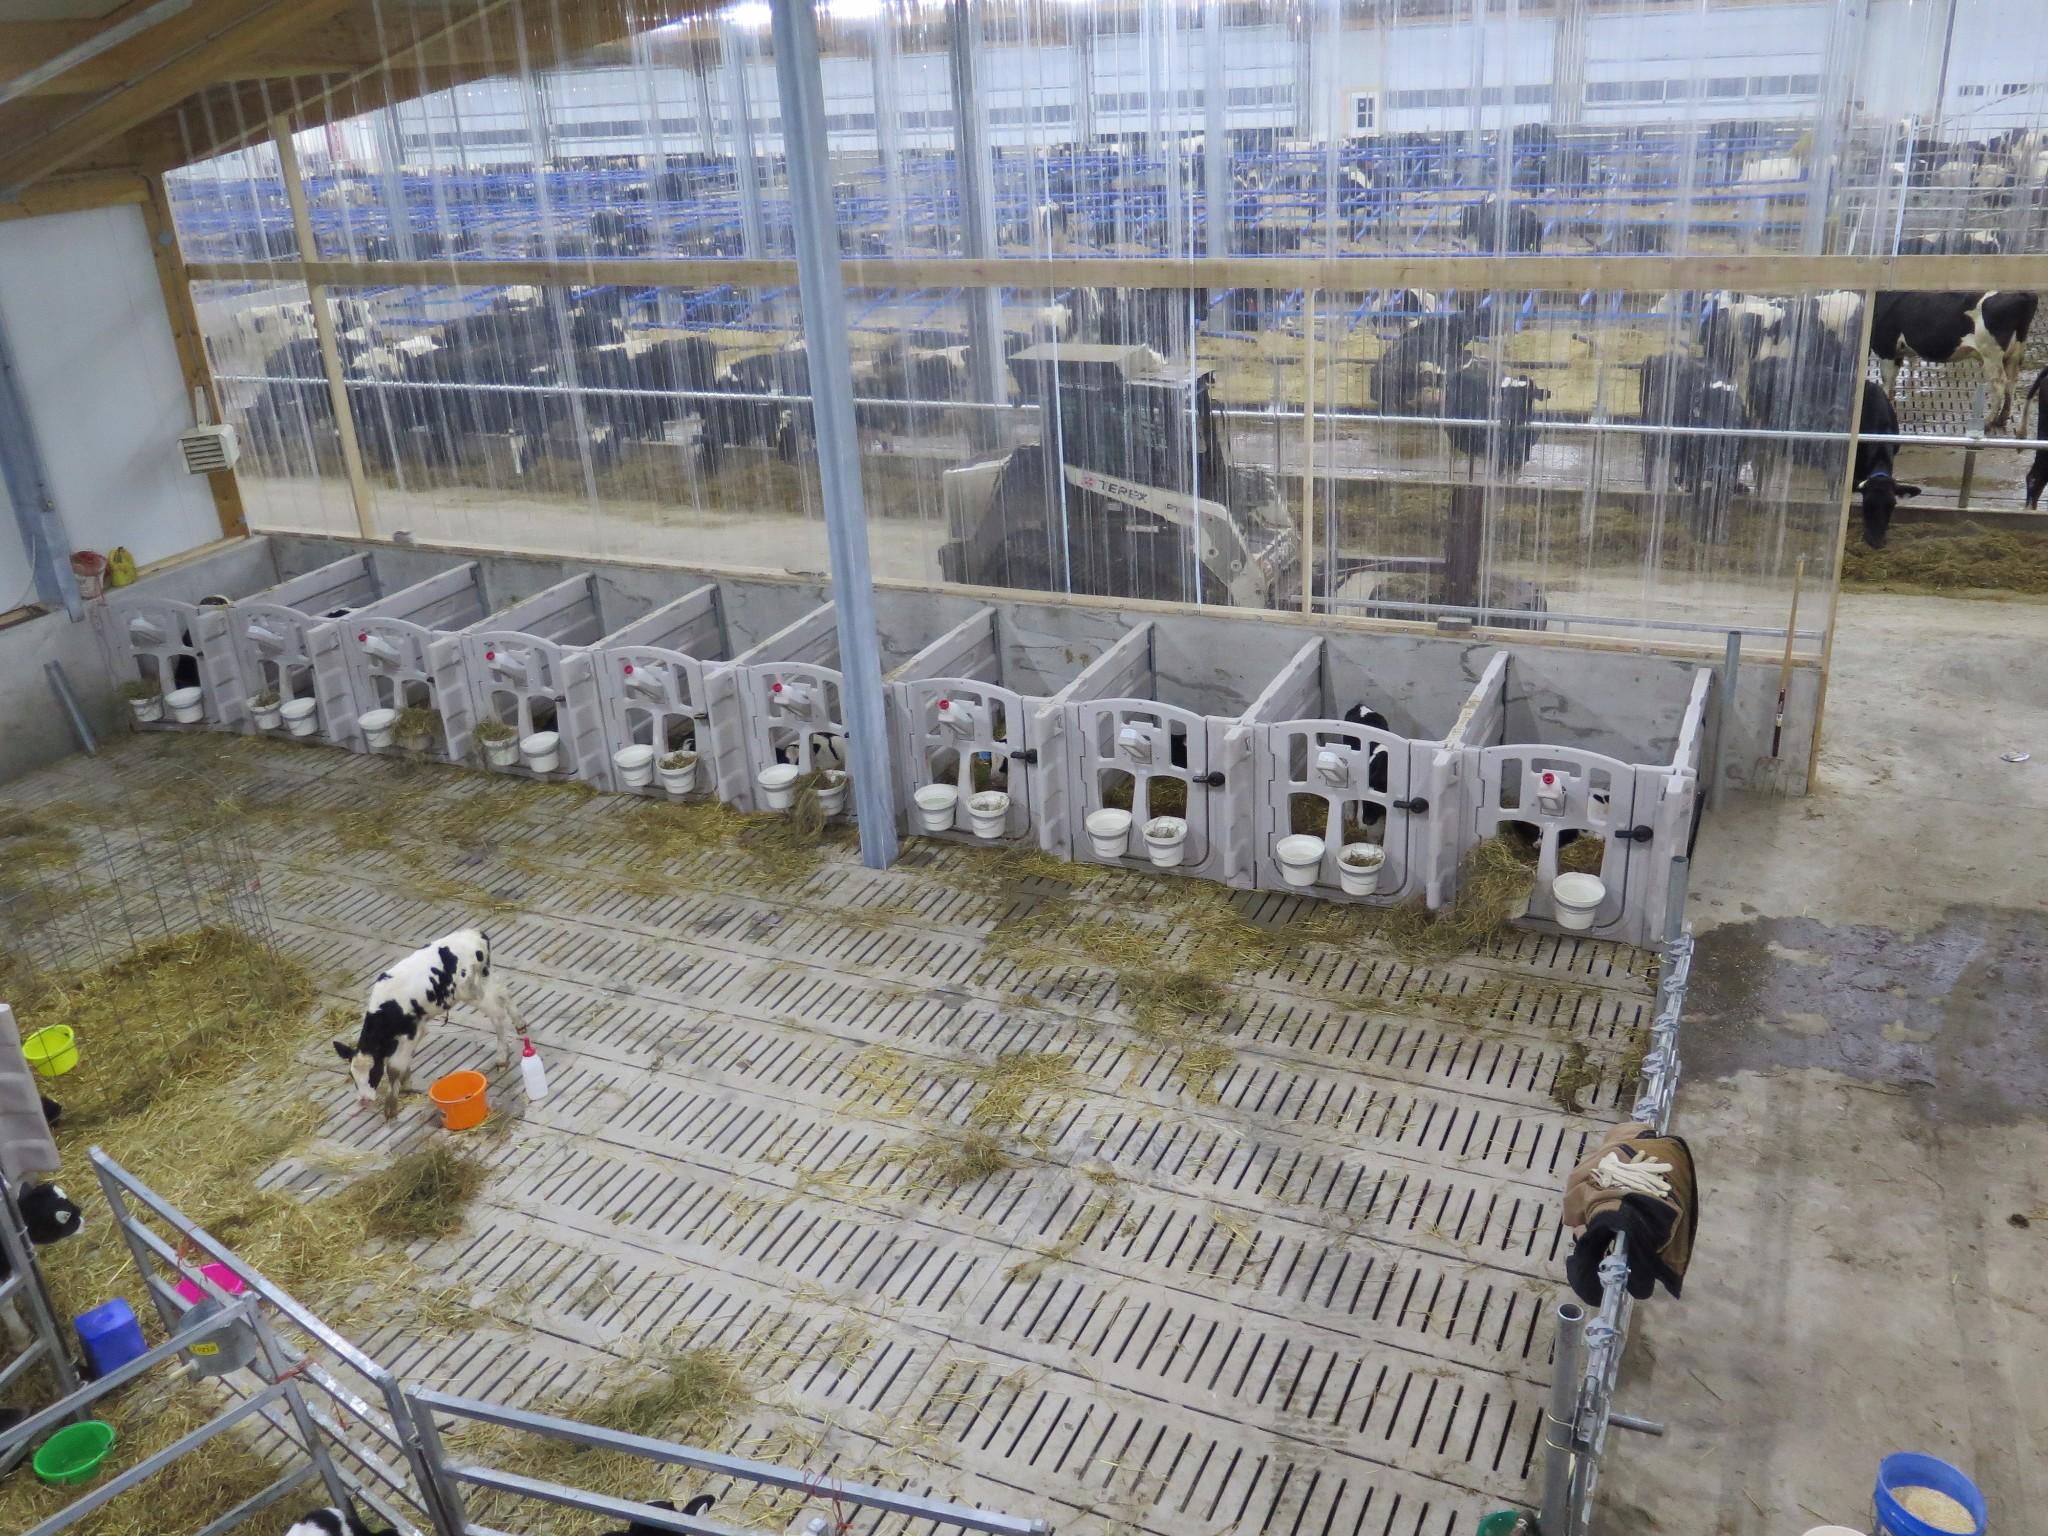 2016 Manitoba - Robot dairy barn